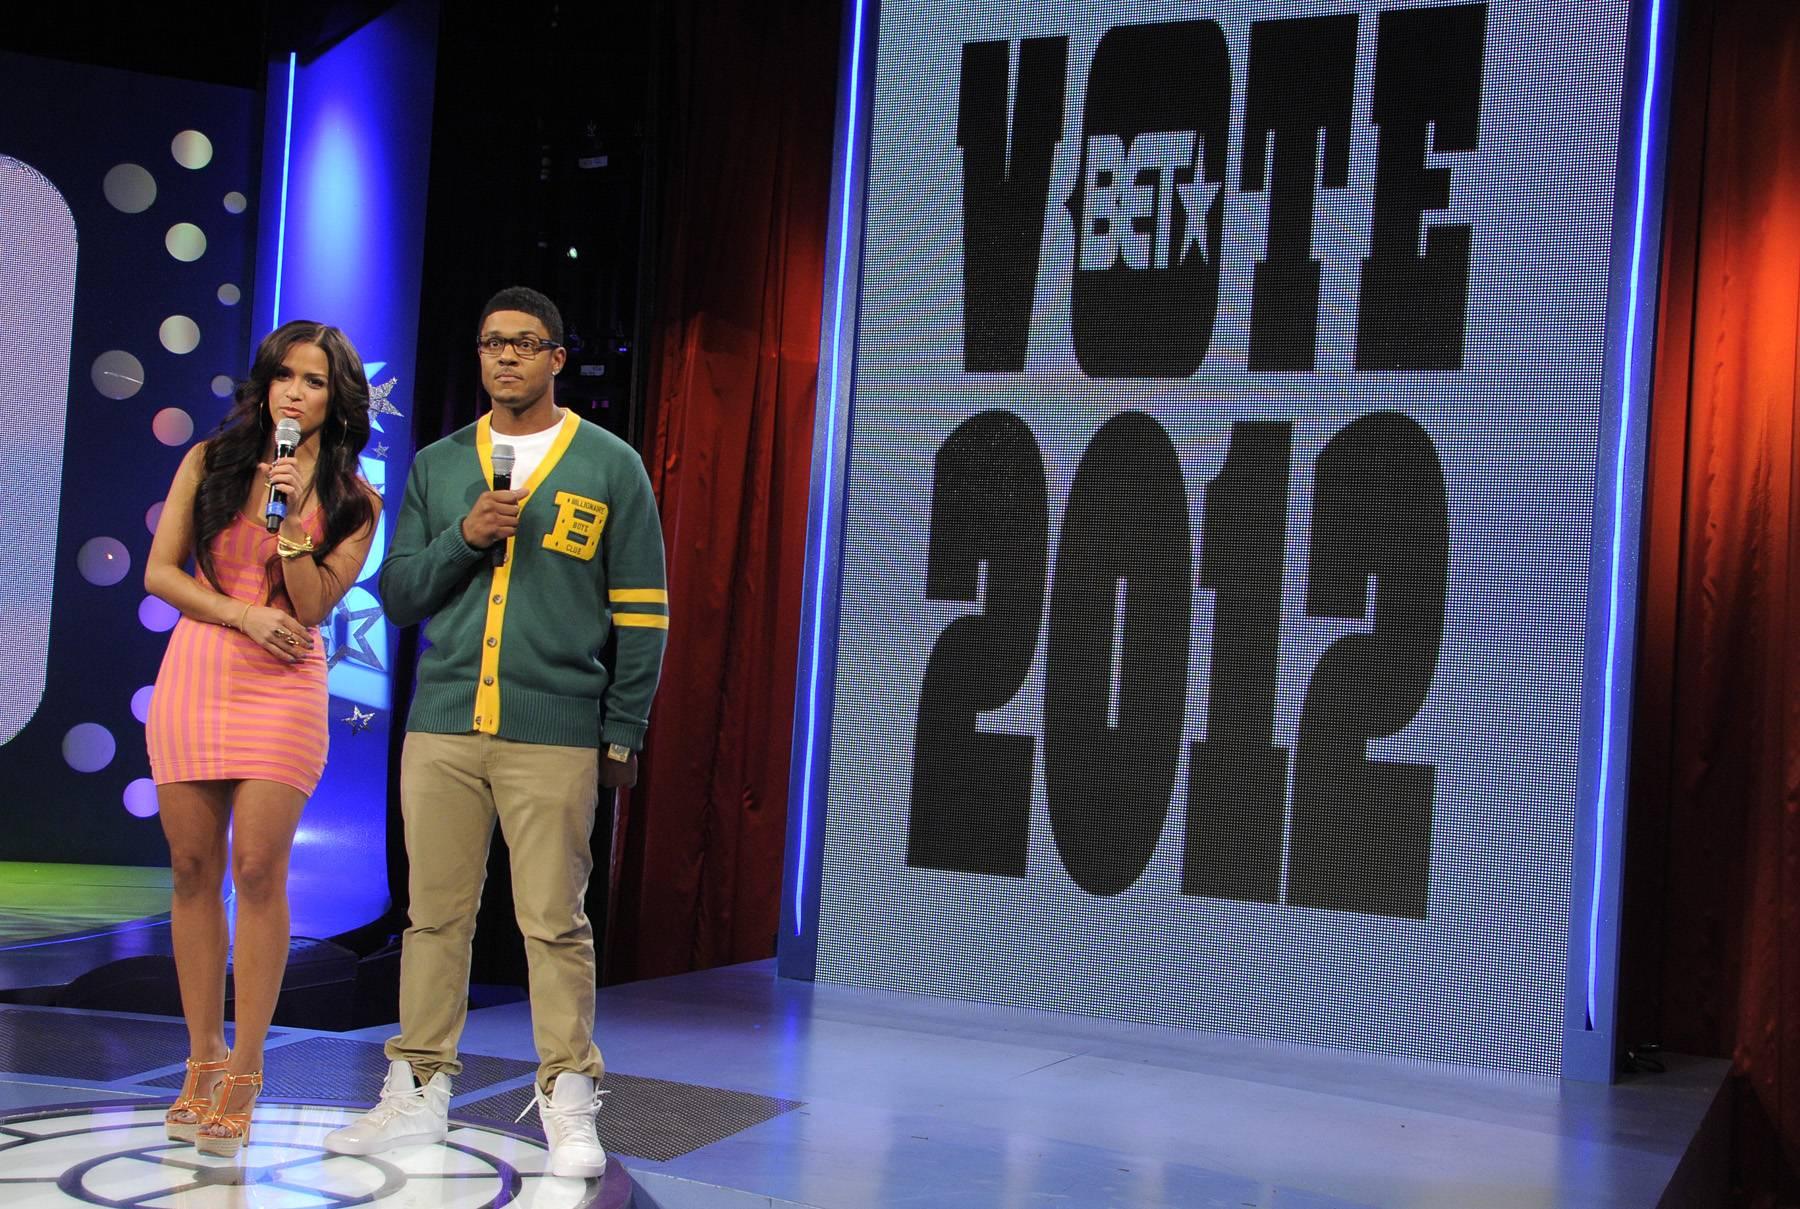 Make Sure to Vote - Pooch Hall and Rocsi Diaz at 106 & Park, April 12, 2012. (Photo: John Ricard / BET)